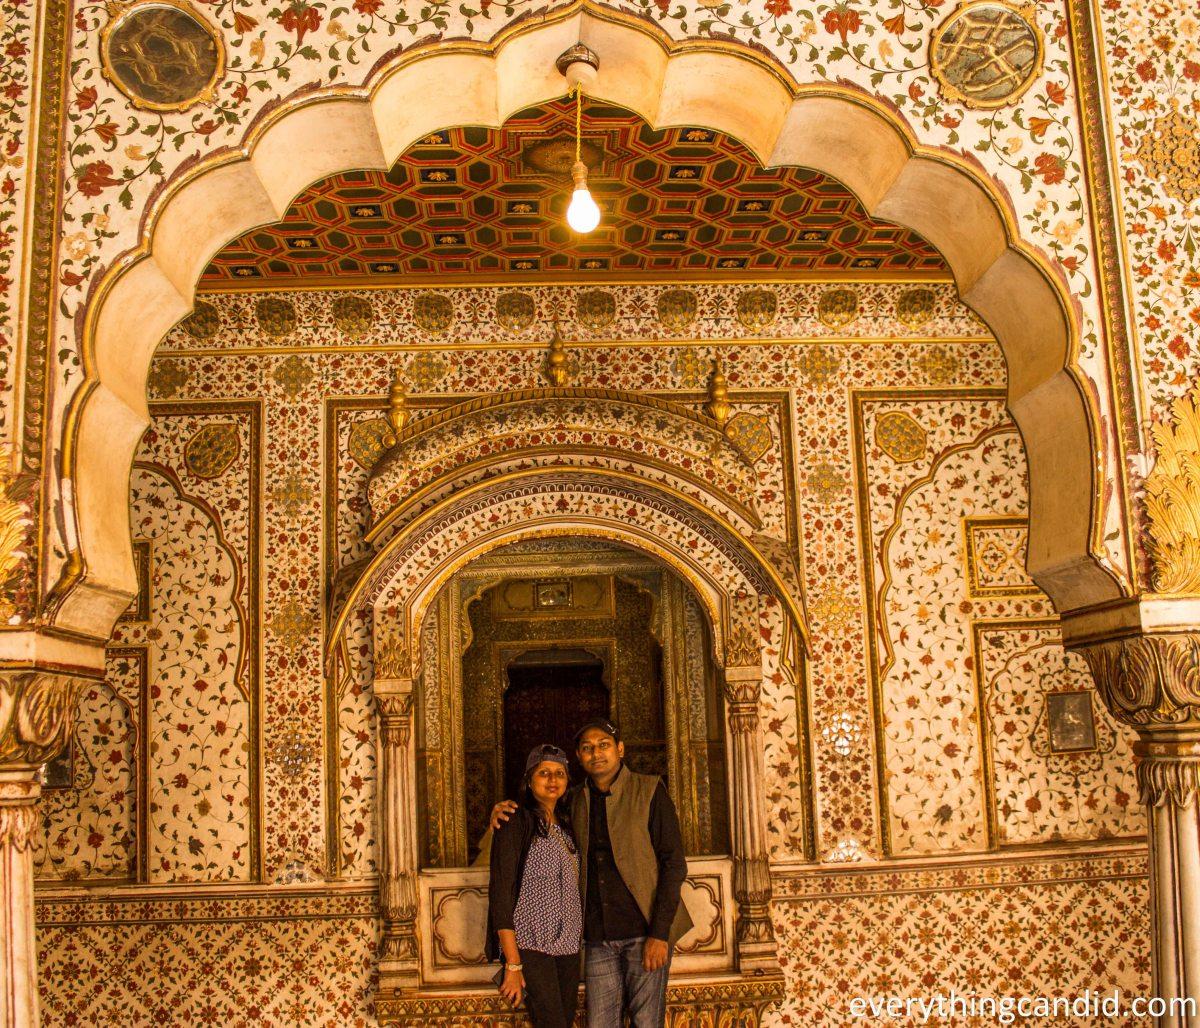 Karni mata, Bik, Rat Temple, Rajasthan, India, Bikaner, fort, Junagarh